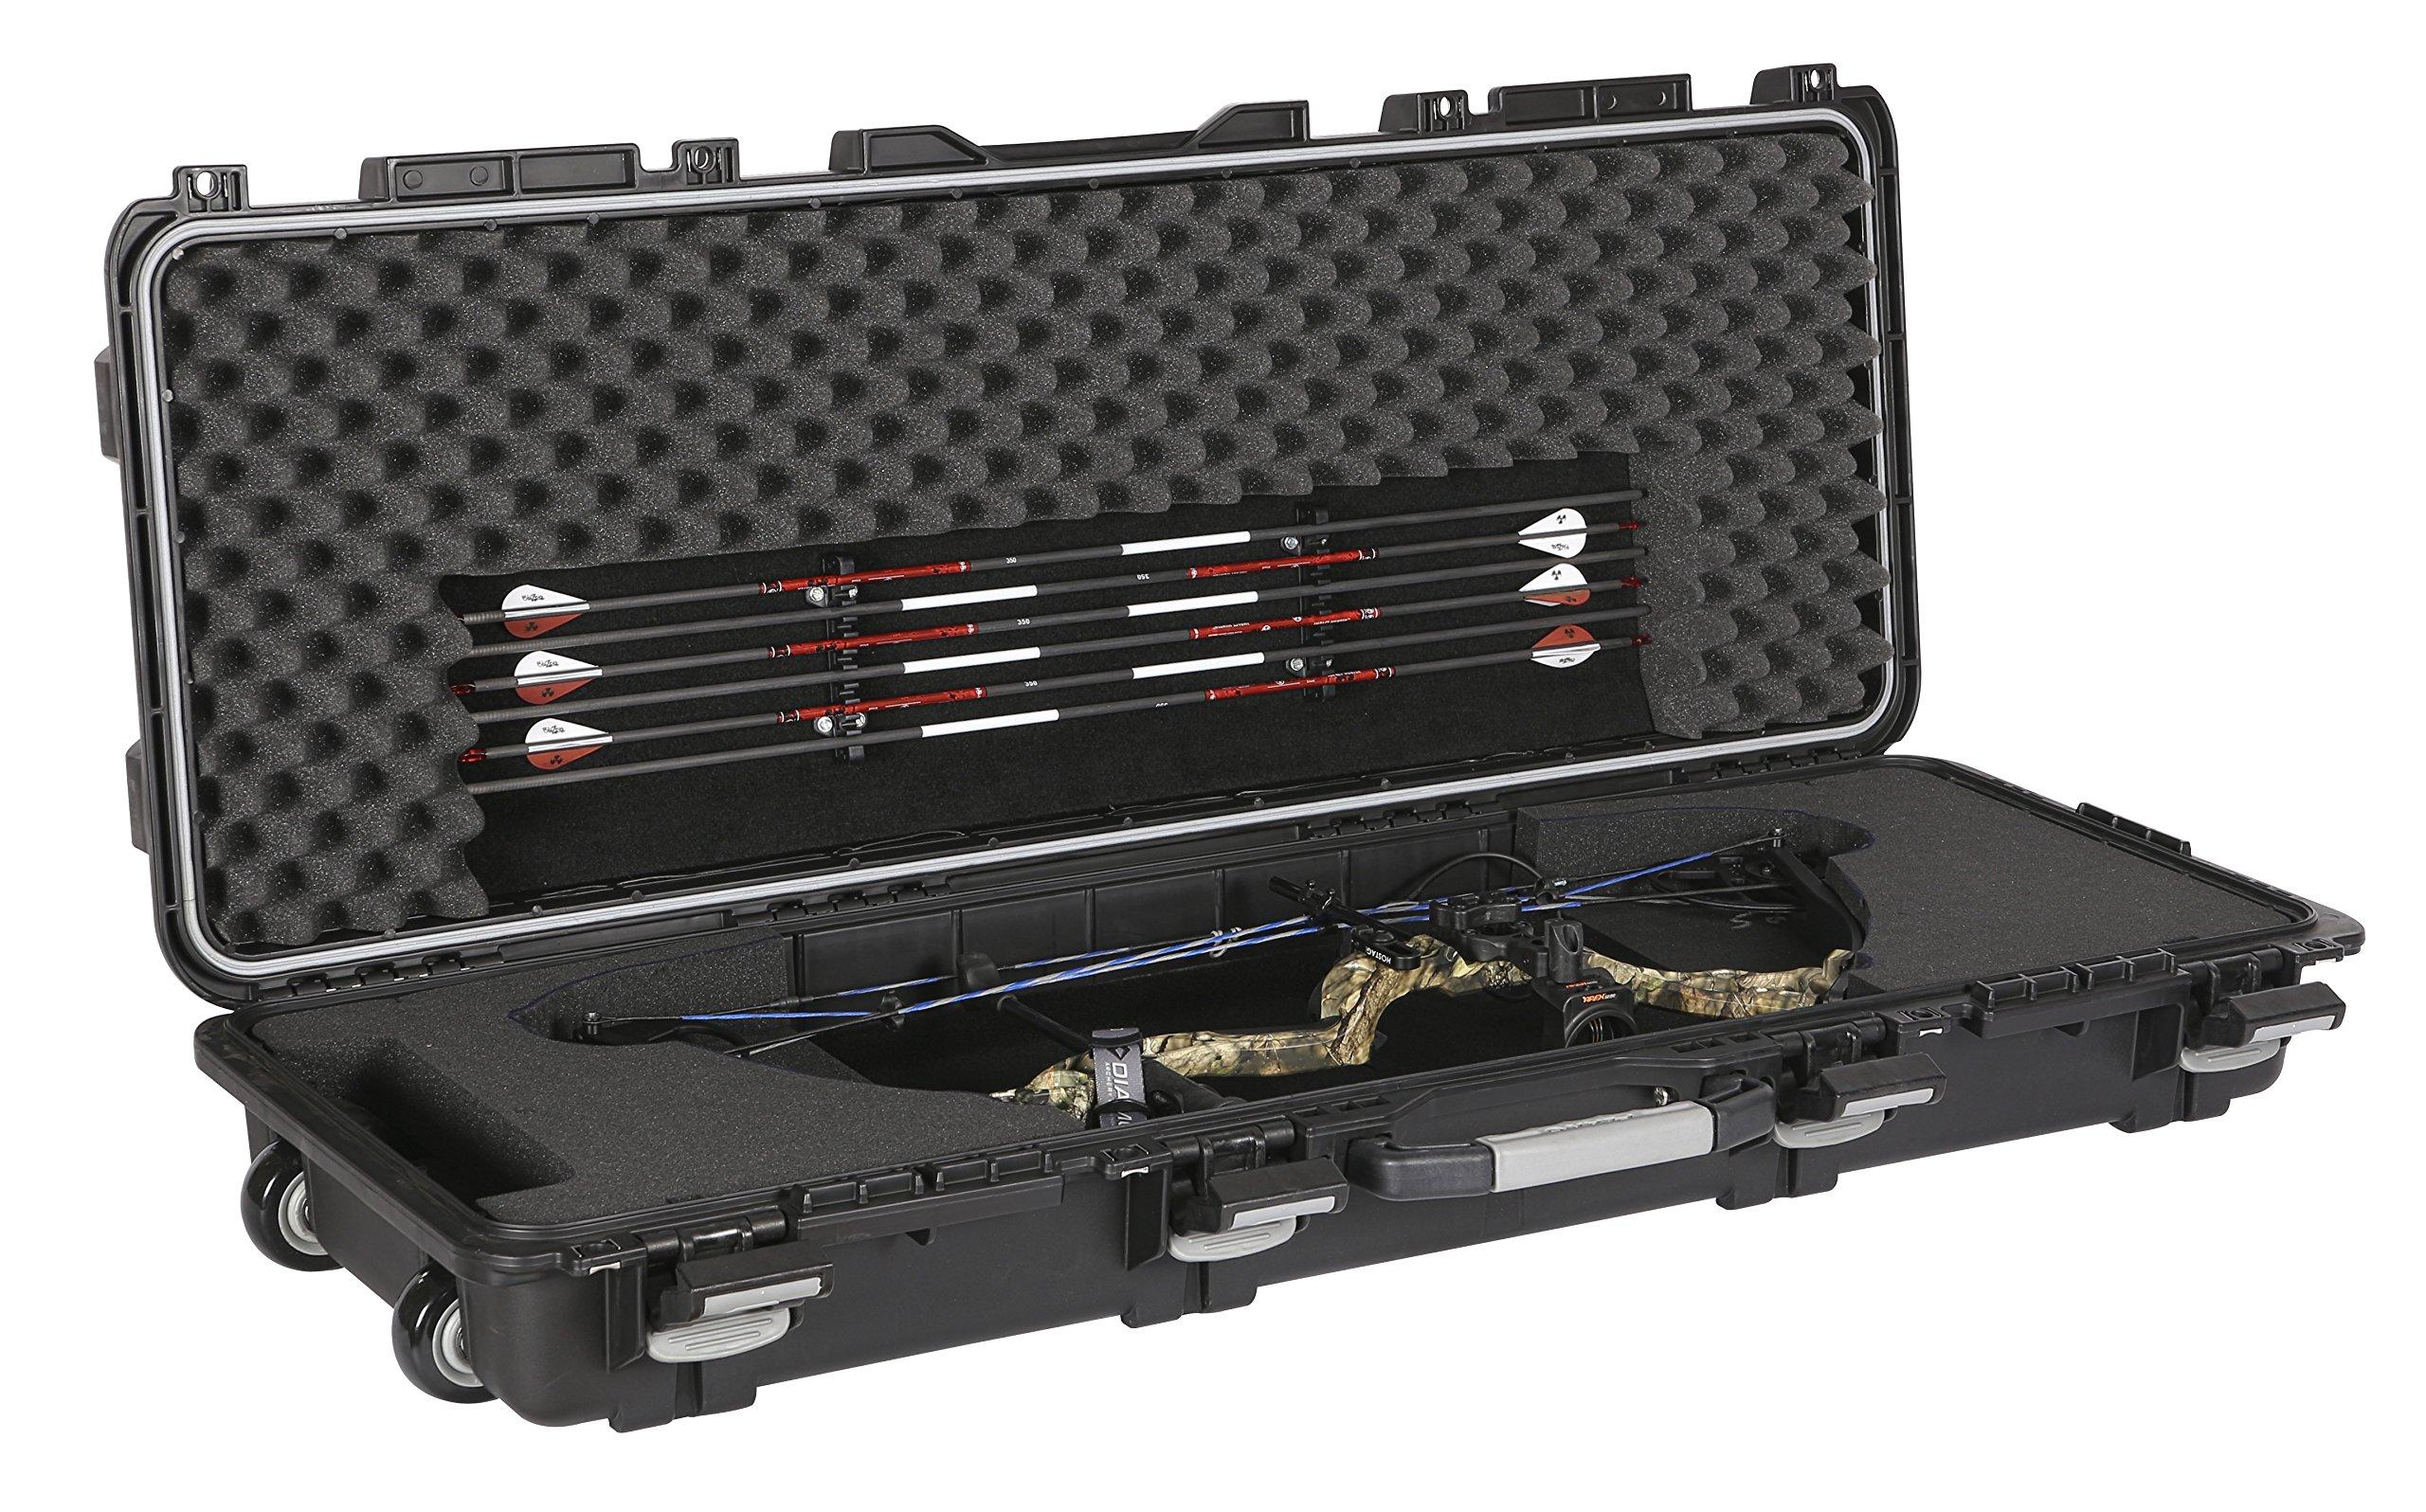 Plano Mil-Spec Fieldlocker Compound Bow Case